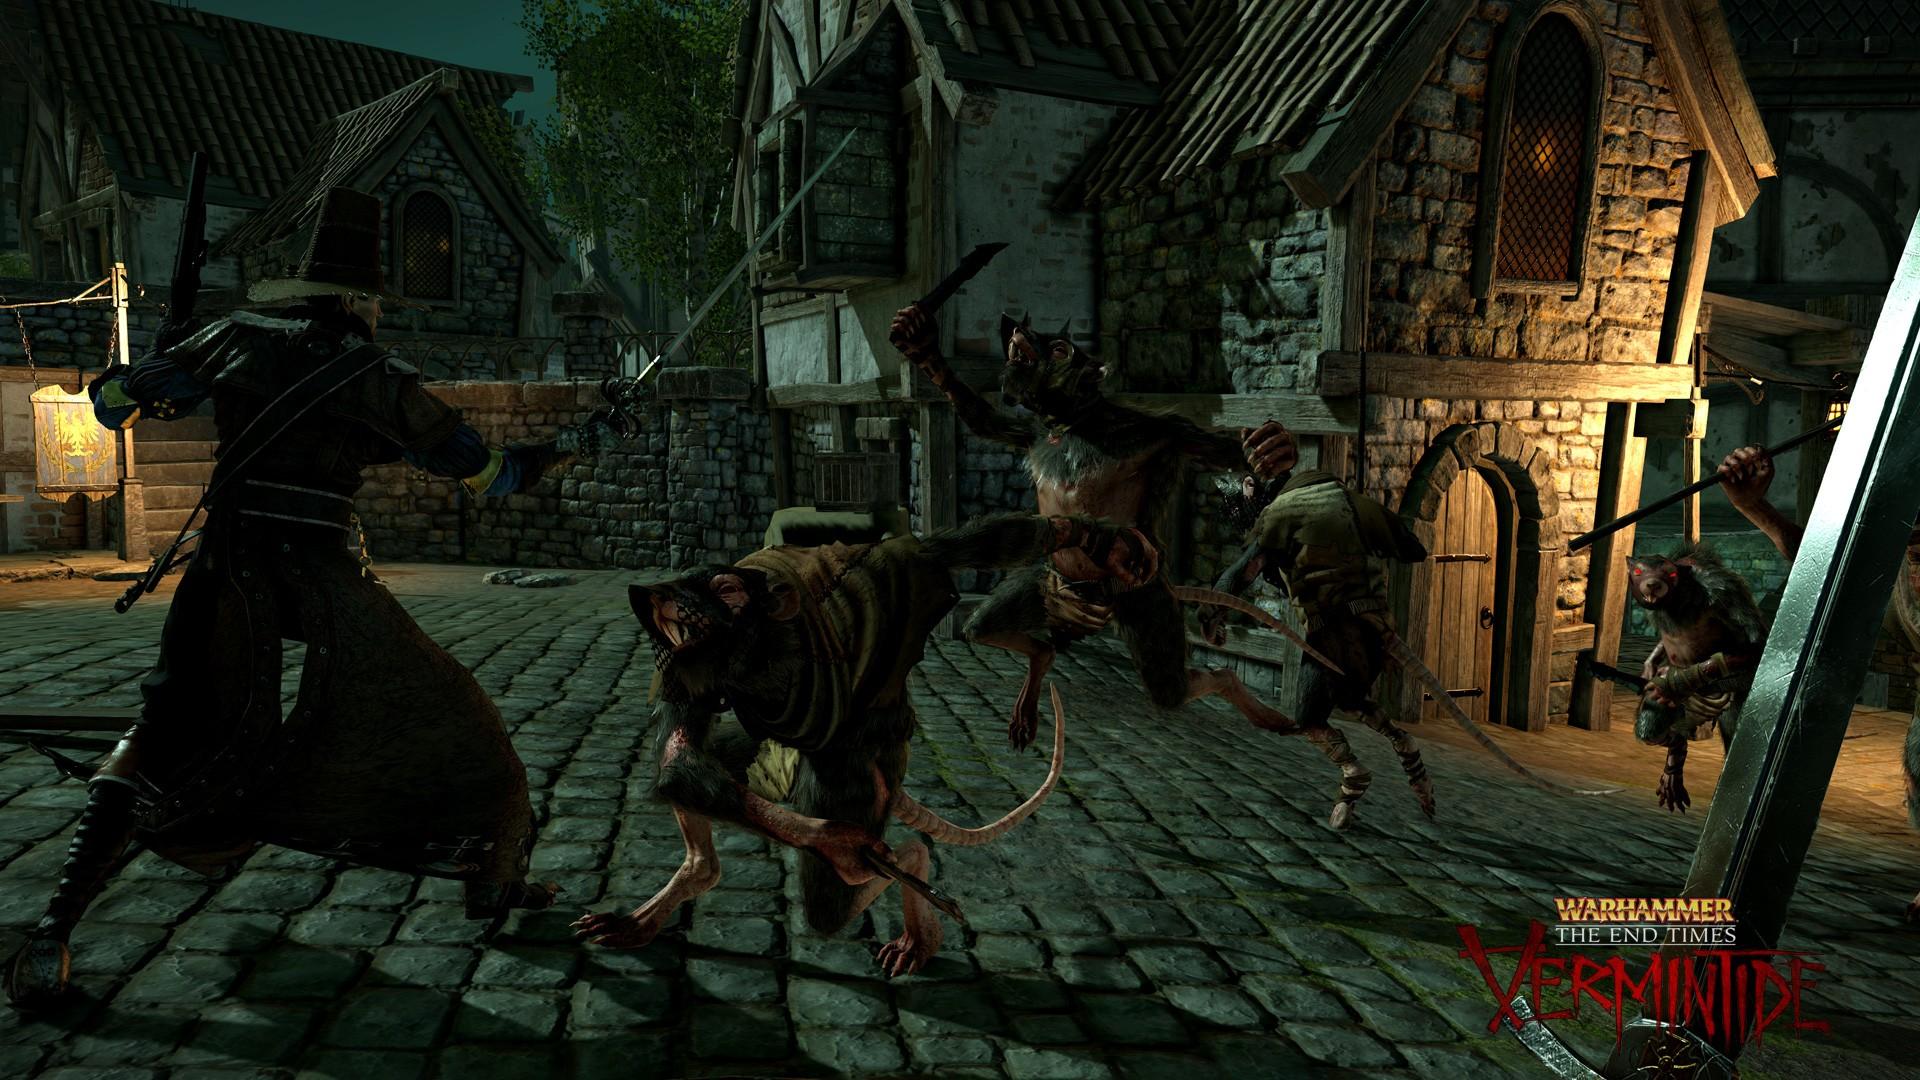 Warhammer End Times Vermintide Revealed Delivers Fantasy